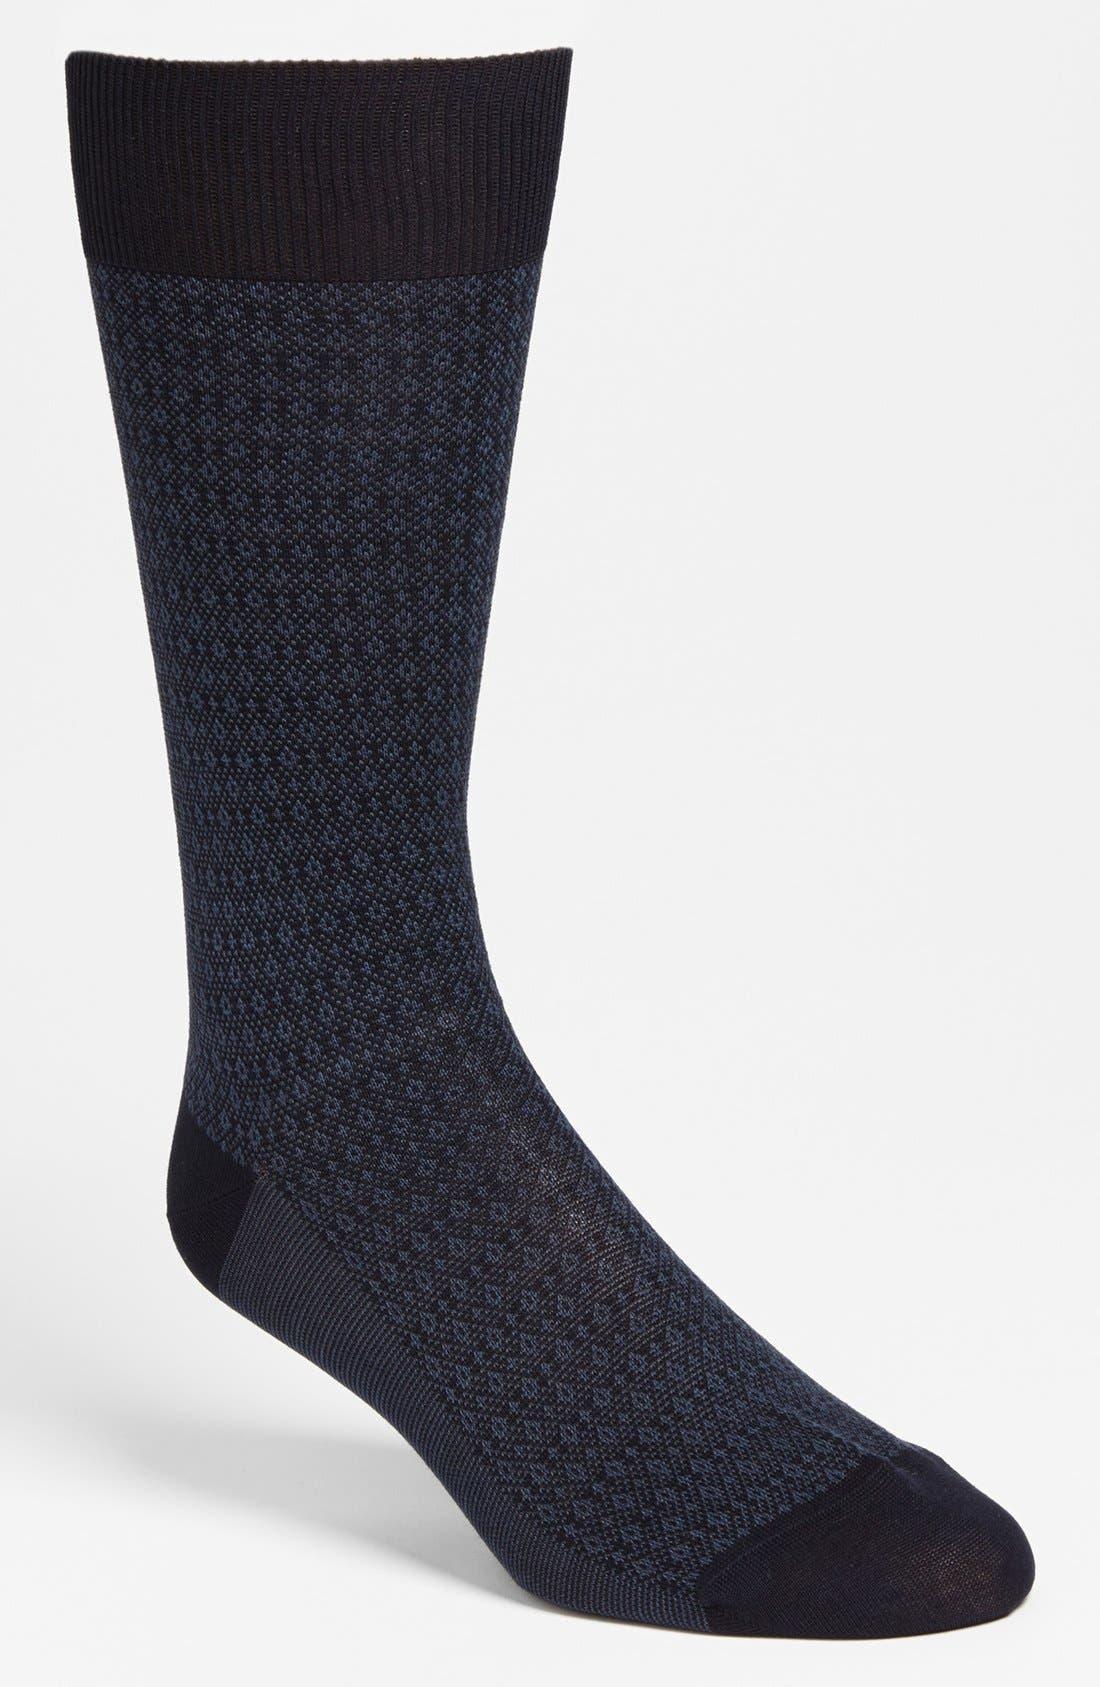 Alternate Image 1 Selected - Pantherella 'Fenchurch' Birdseye Socks